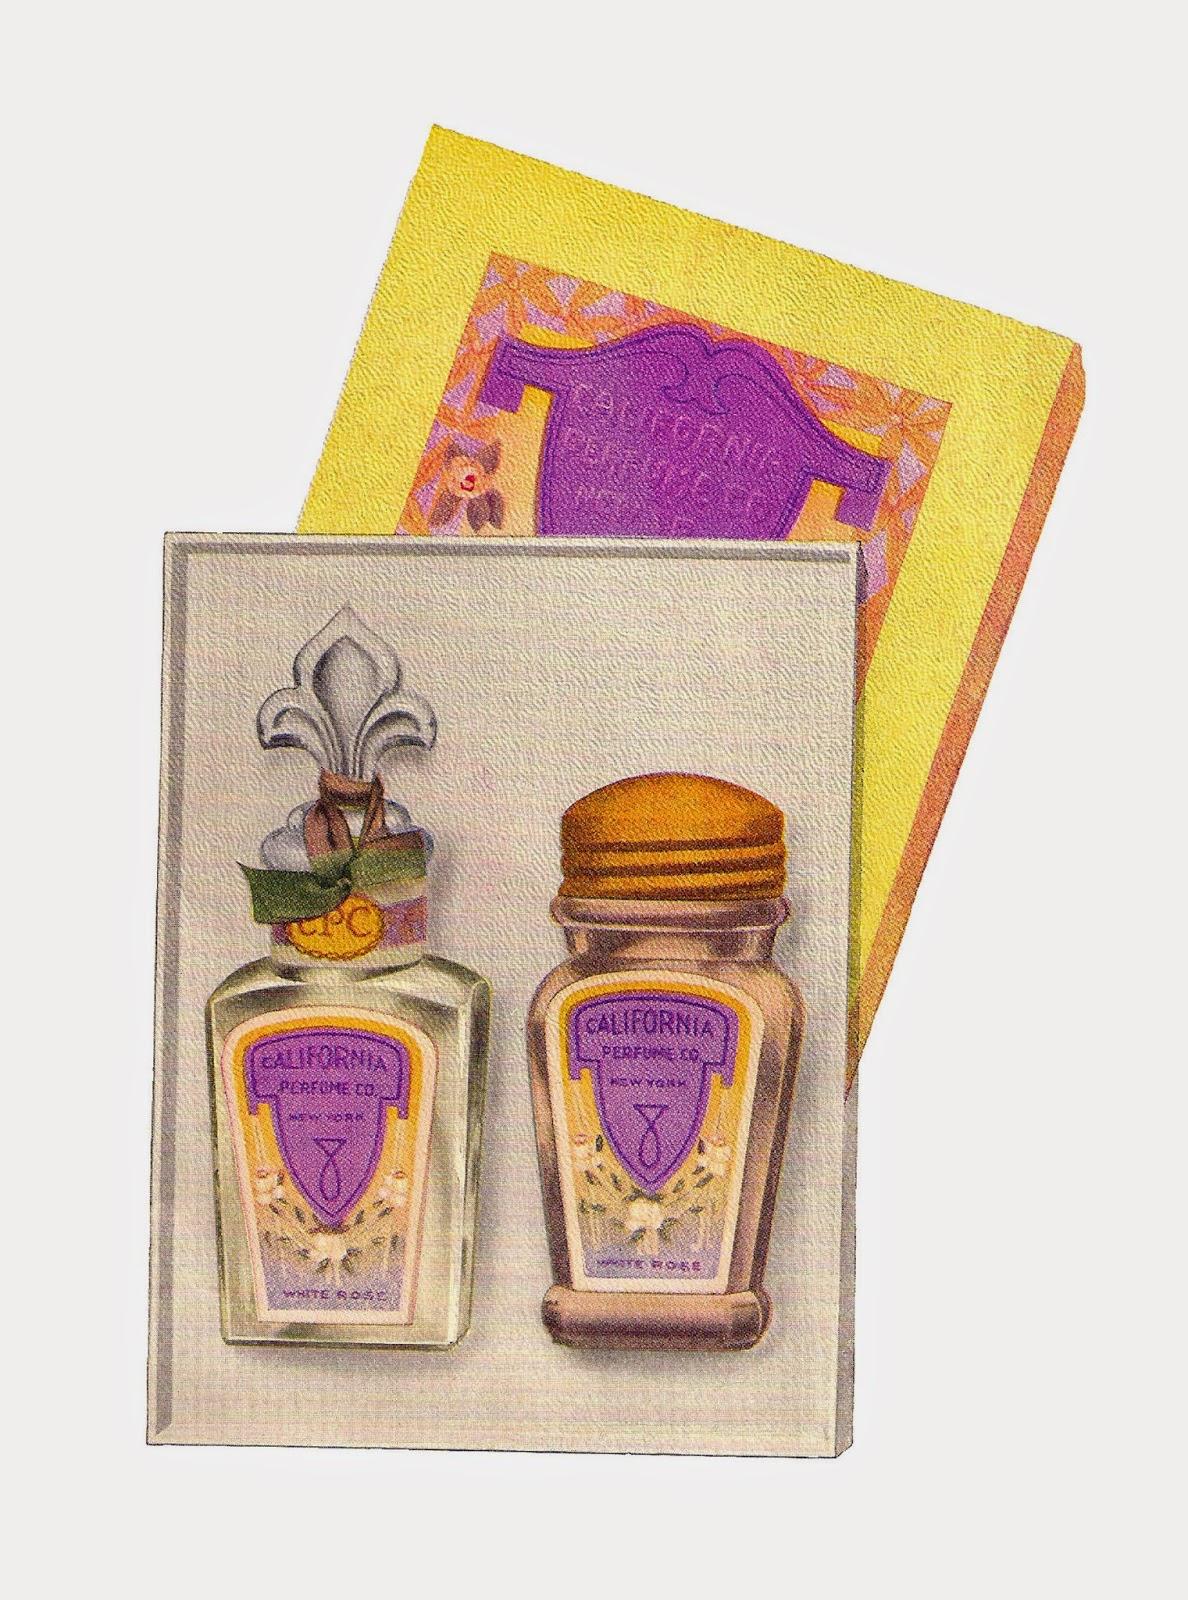 http://2.bp.blogspot.com/-yxoH_1r1ylE/VRWznaqeURI/AAAAAAAAWBo/fExFcgDkcYM/s1600/bottlebox006.jpg